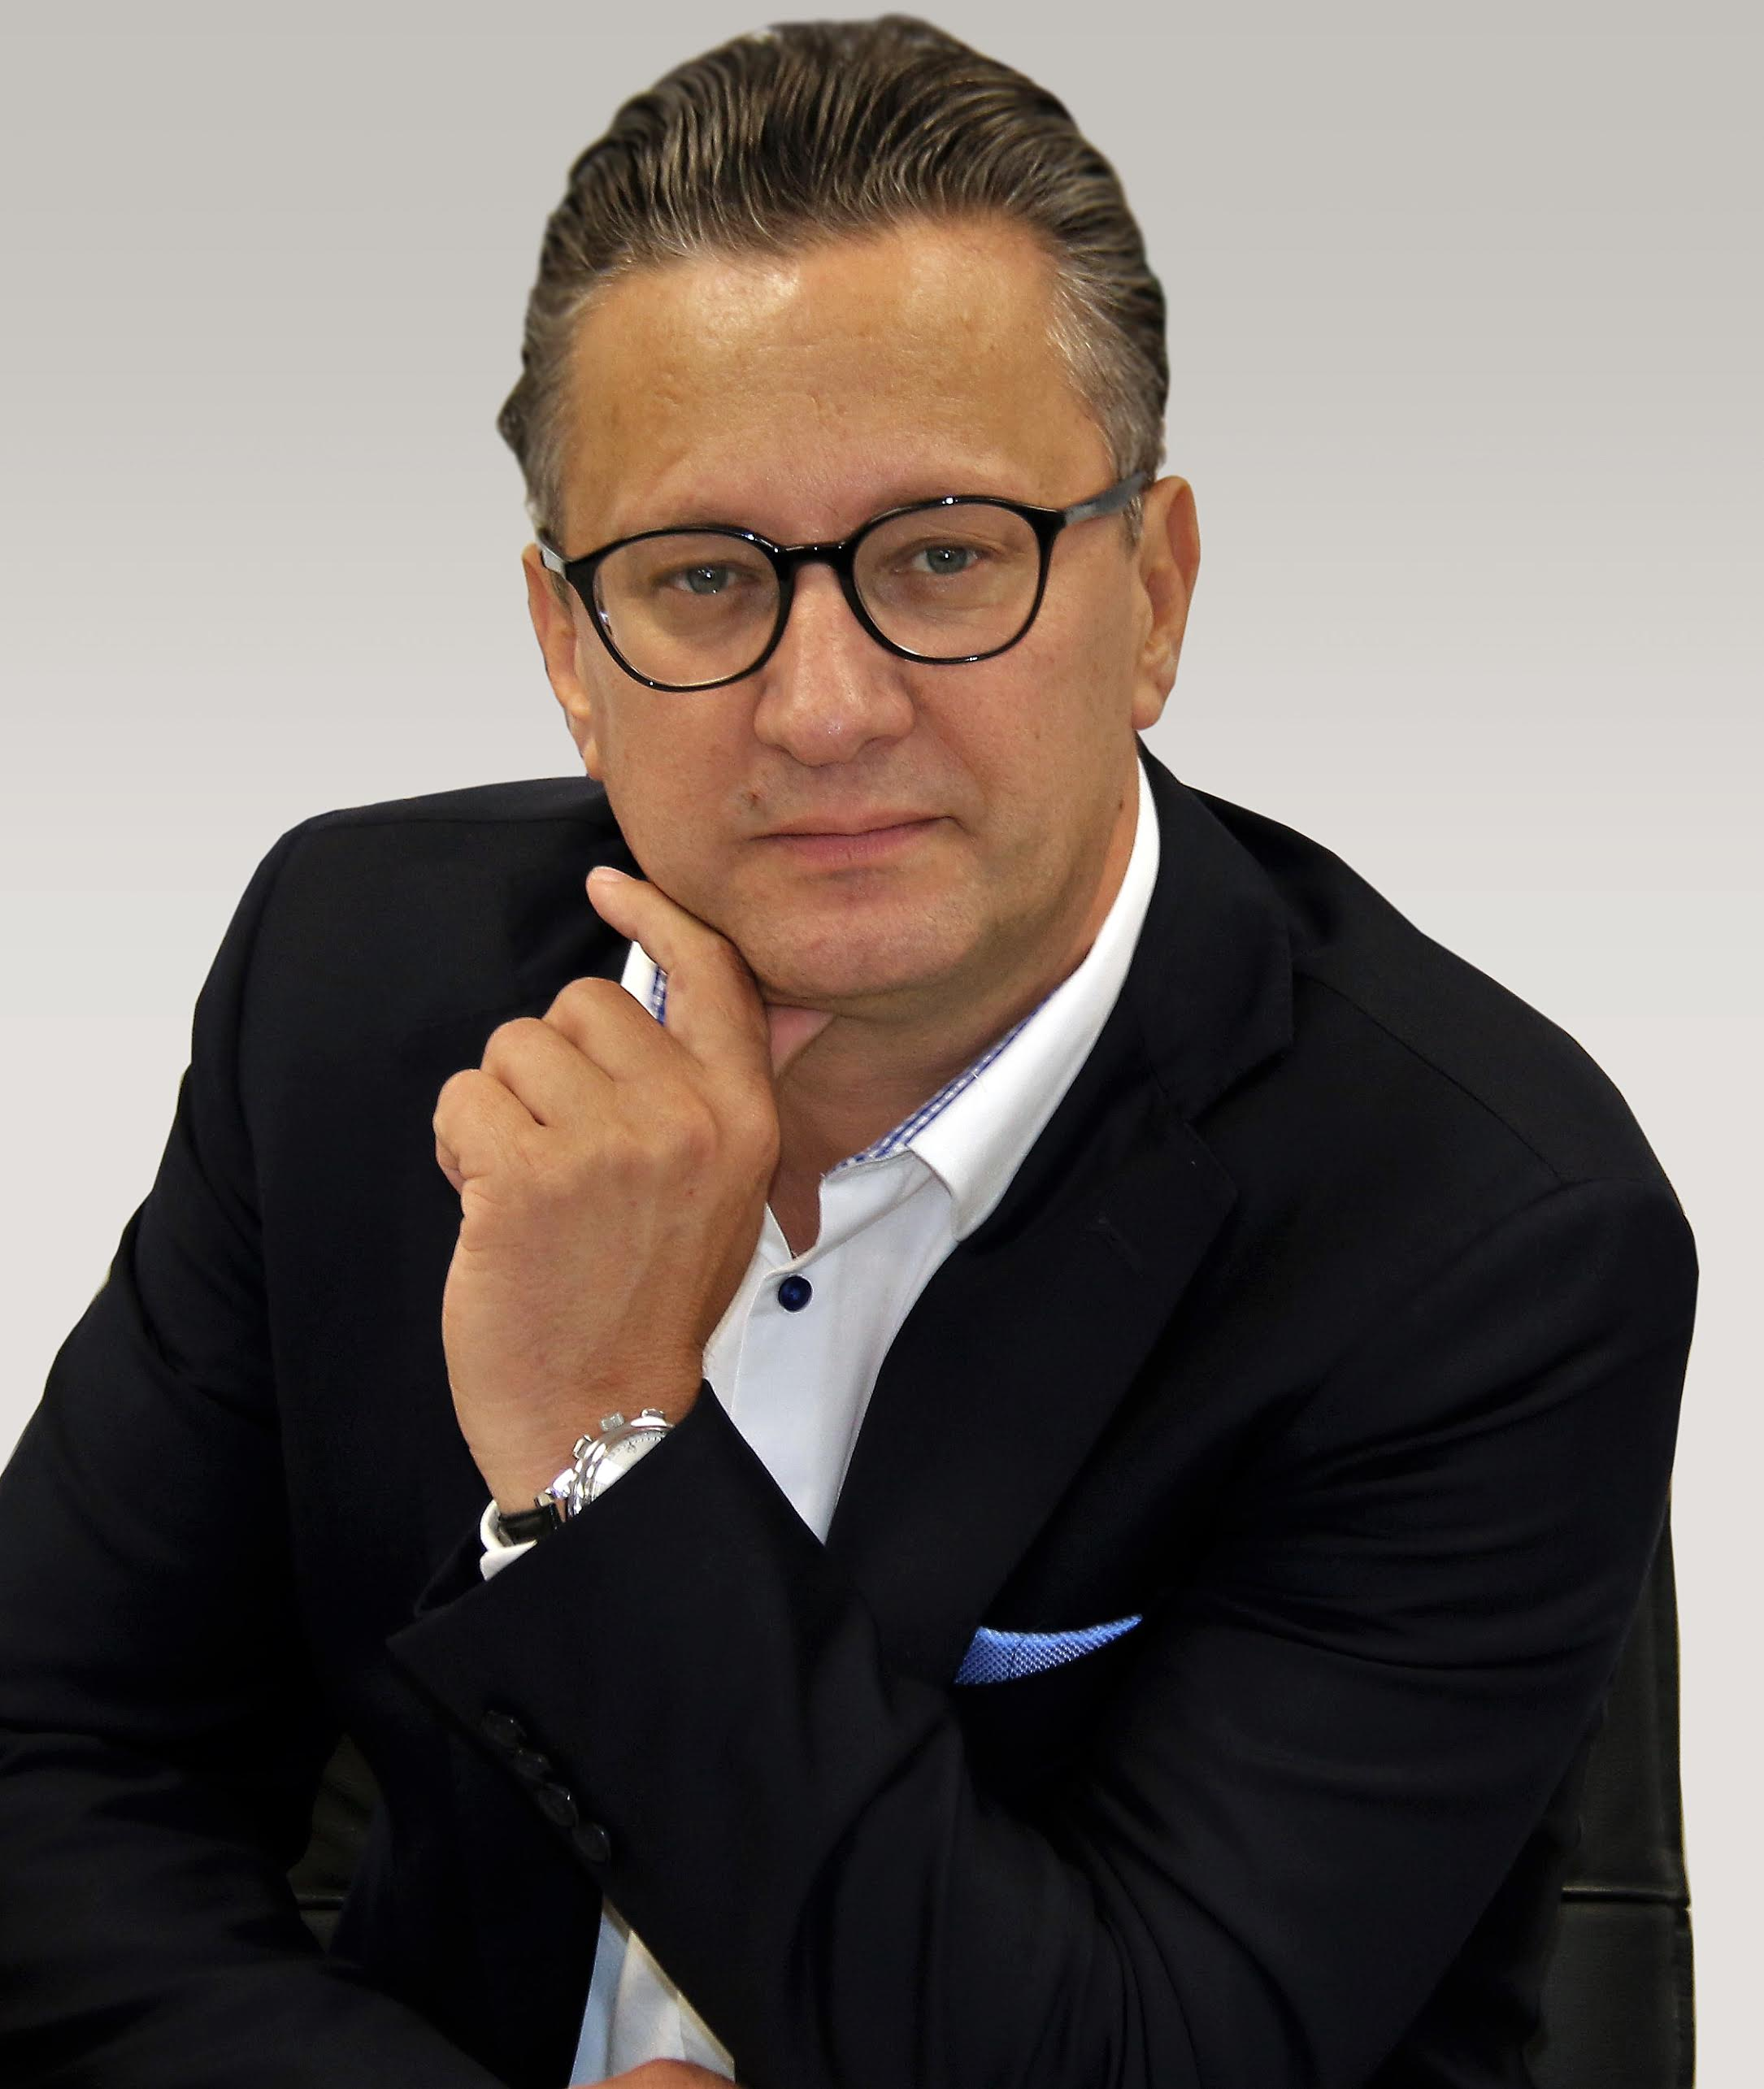 Prof. dr. sc. Zoran Tomić izabran za rektora Sveučilišta u Mostaru